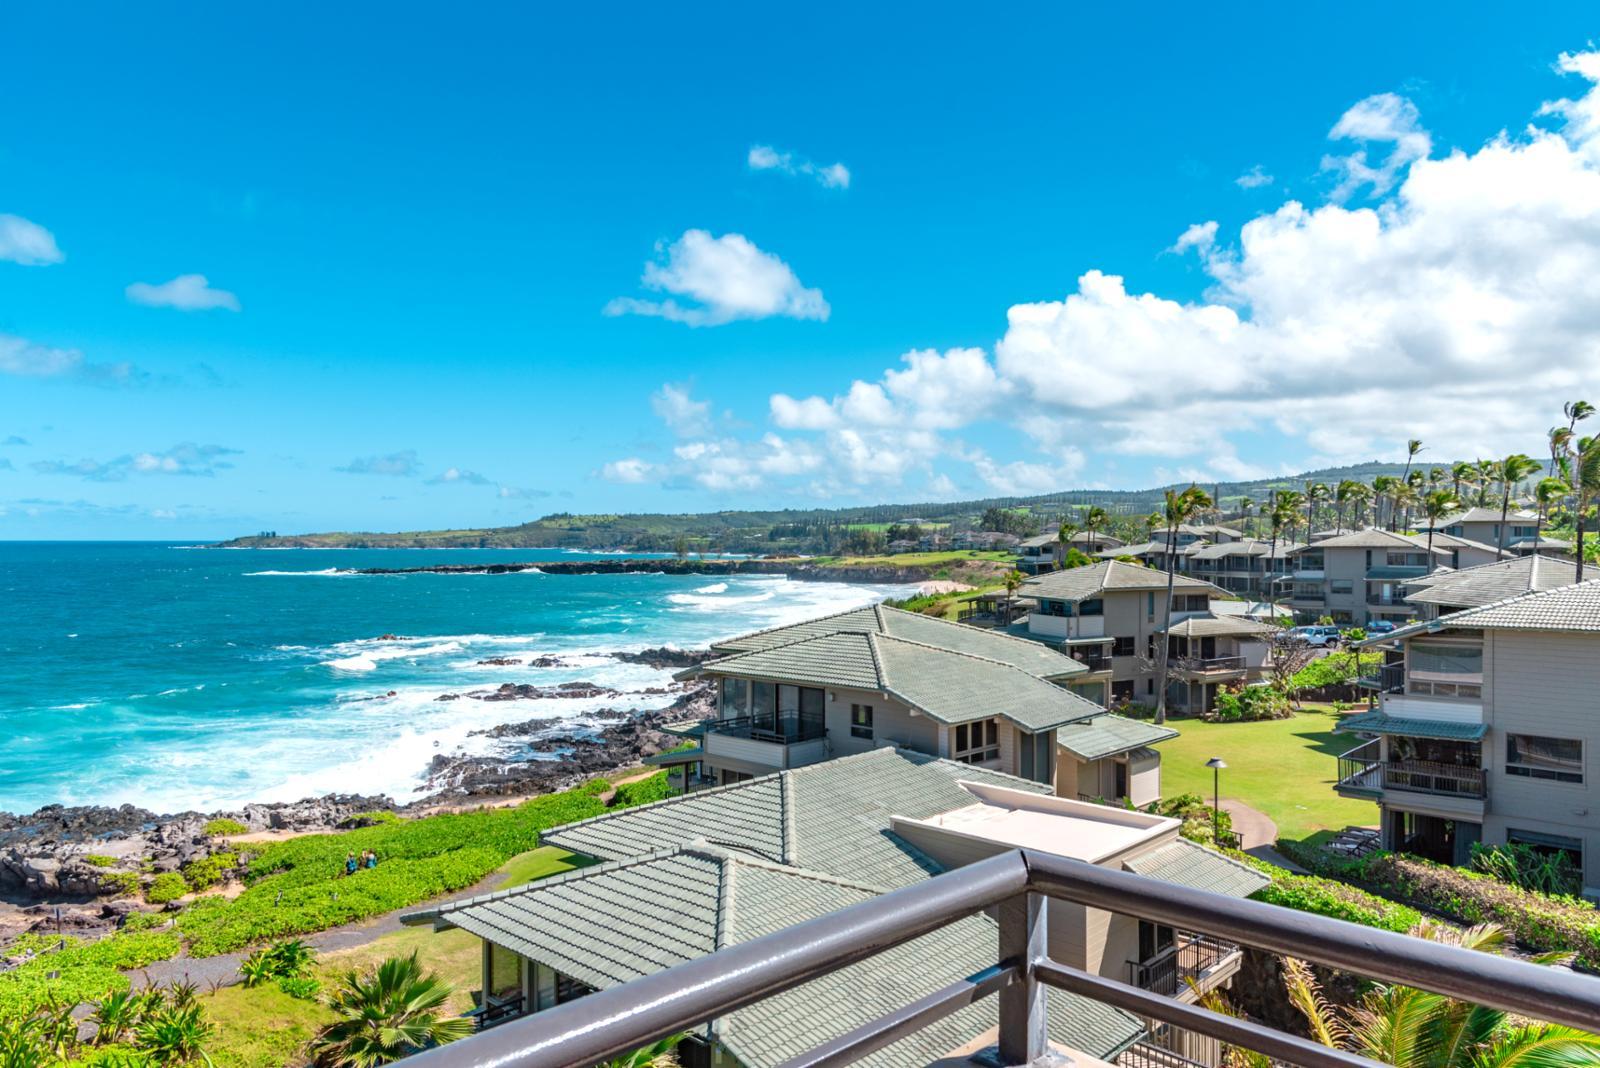 Panoramic views of the beautiful Kapalua Resort!